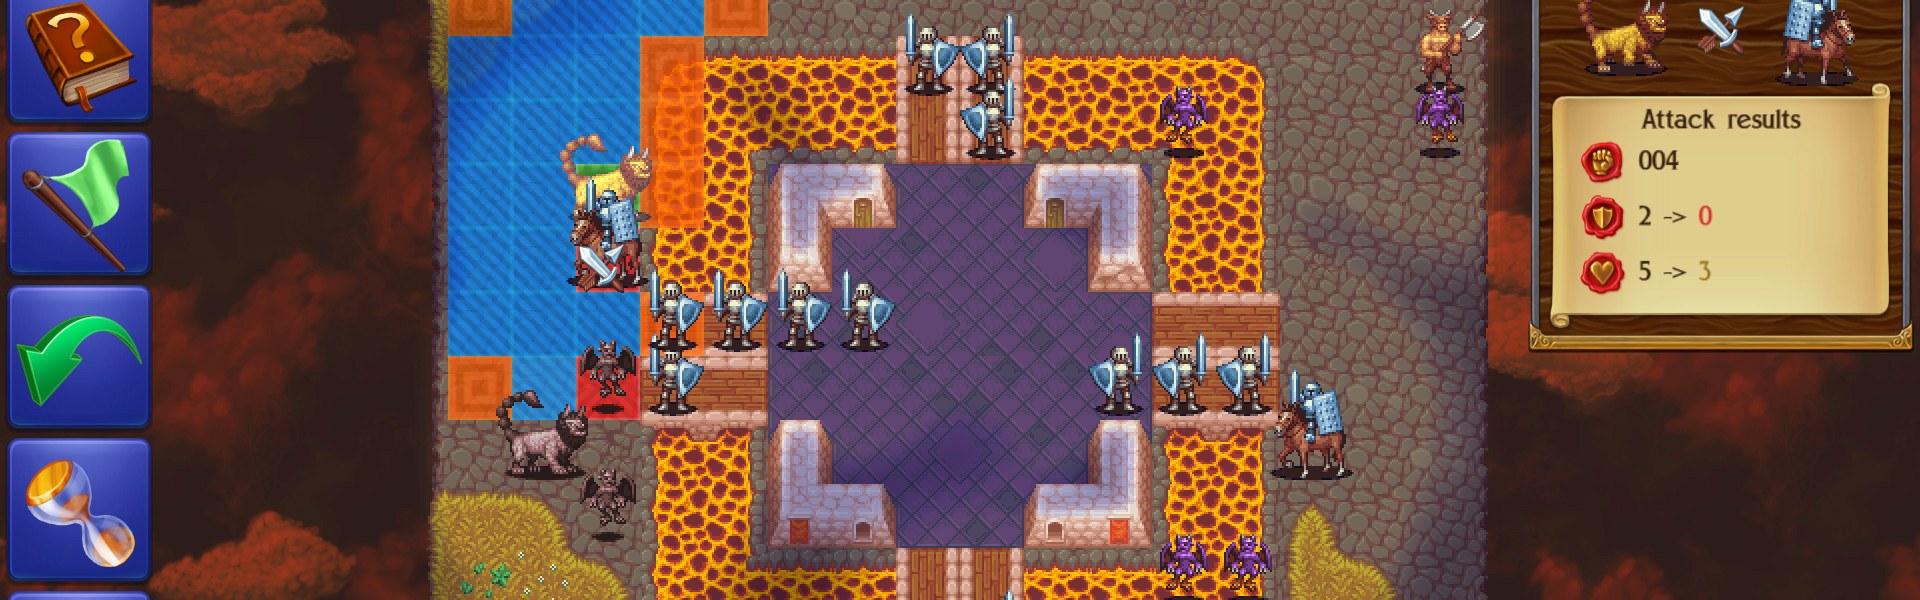 Monstro: Battle Tactics Steam Key GLOBAL